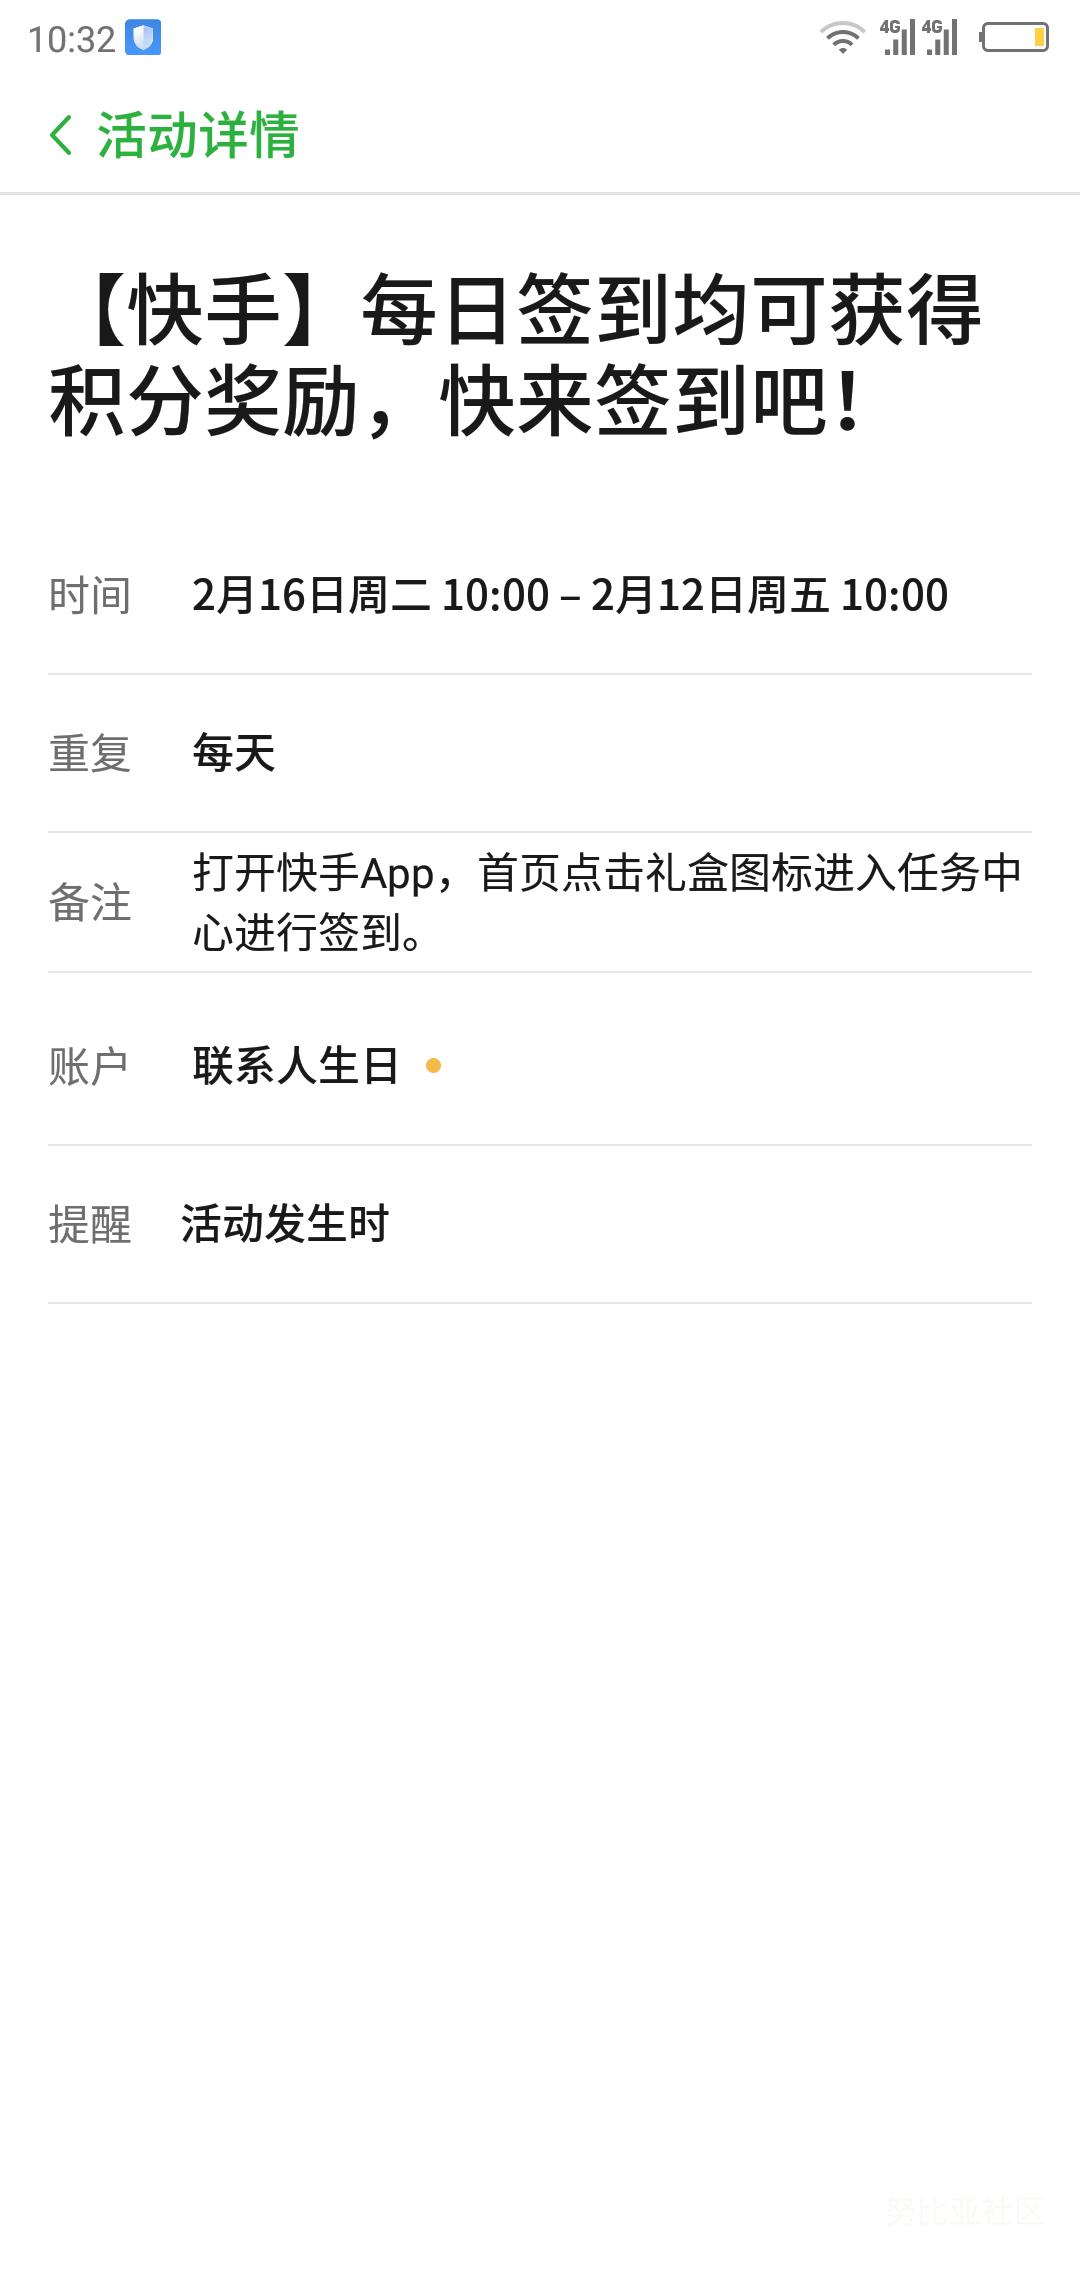 Screenshot_2021-02-16-10-32-07-056.png